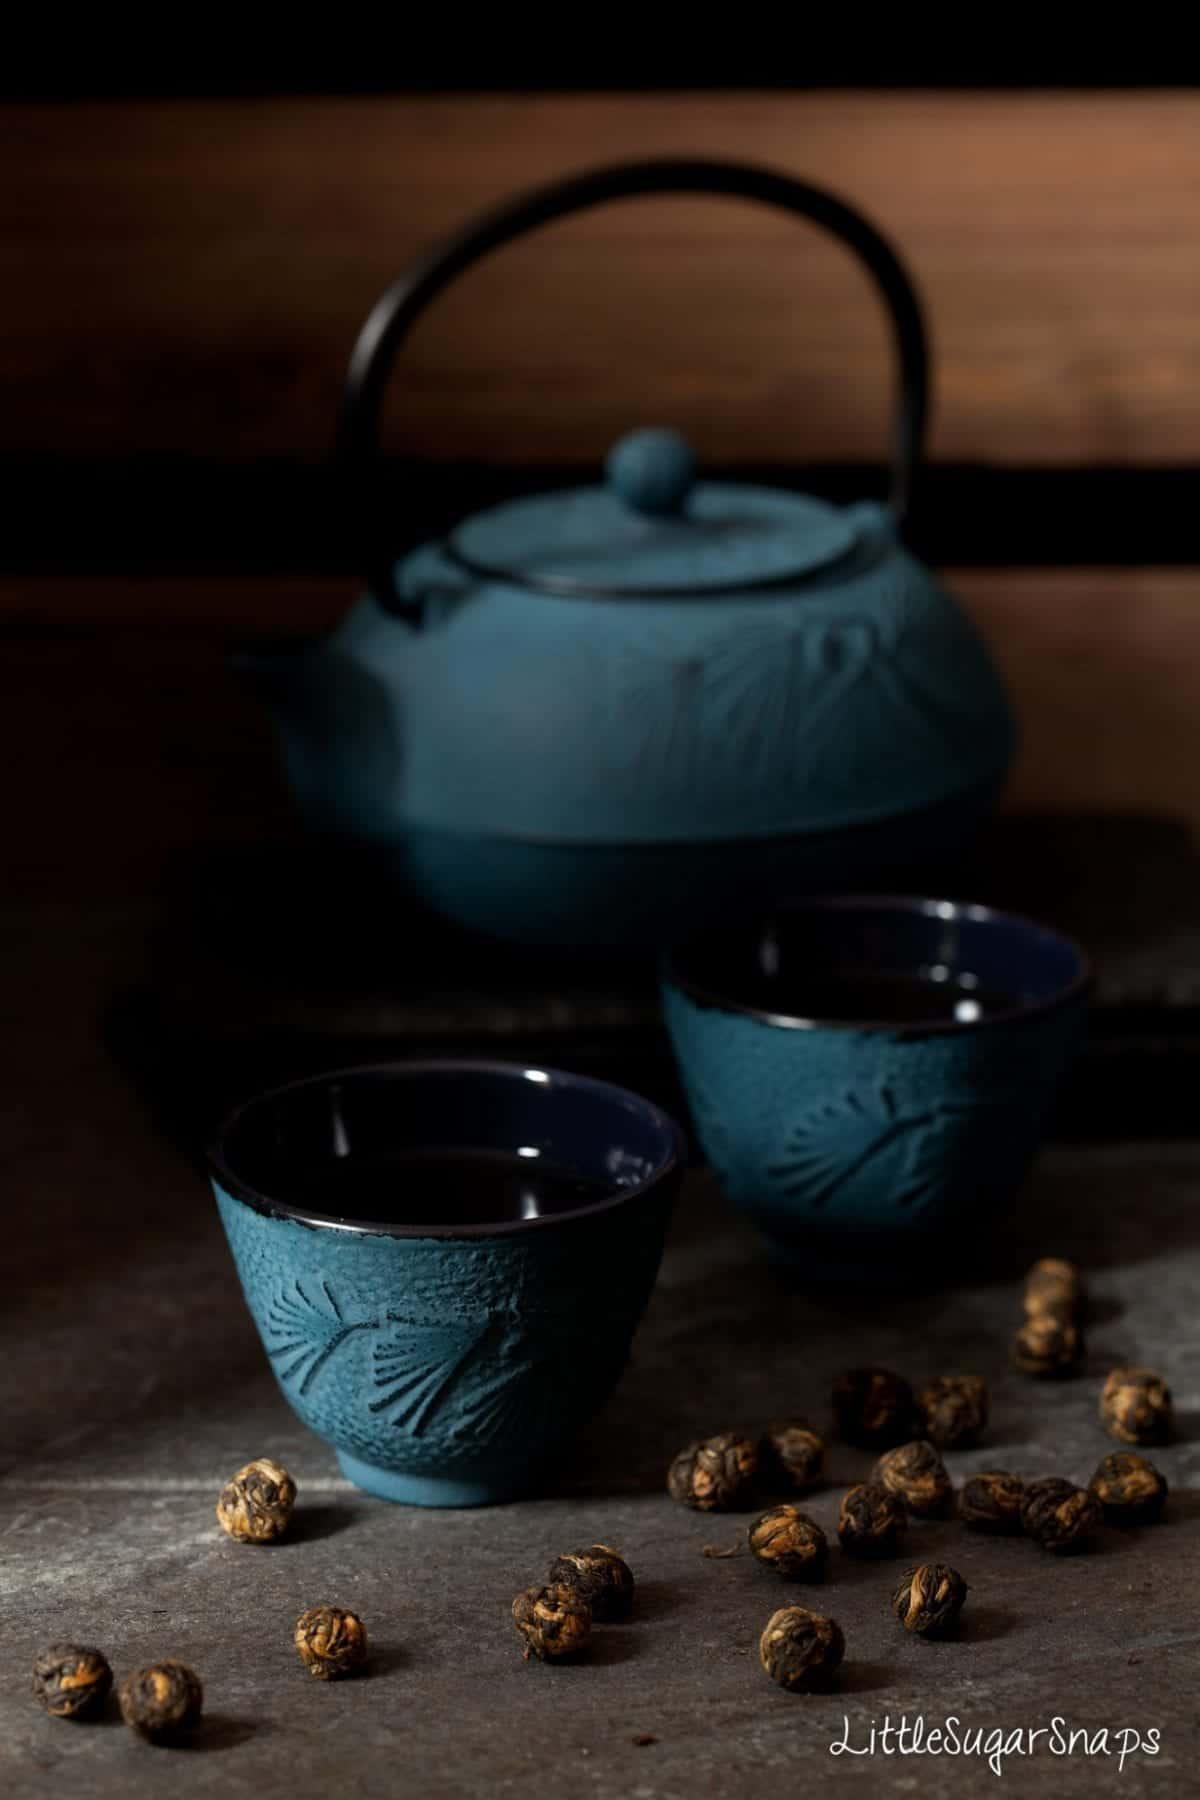 Cast iron tea cups and teapot with tea pearls alongside.